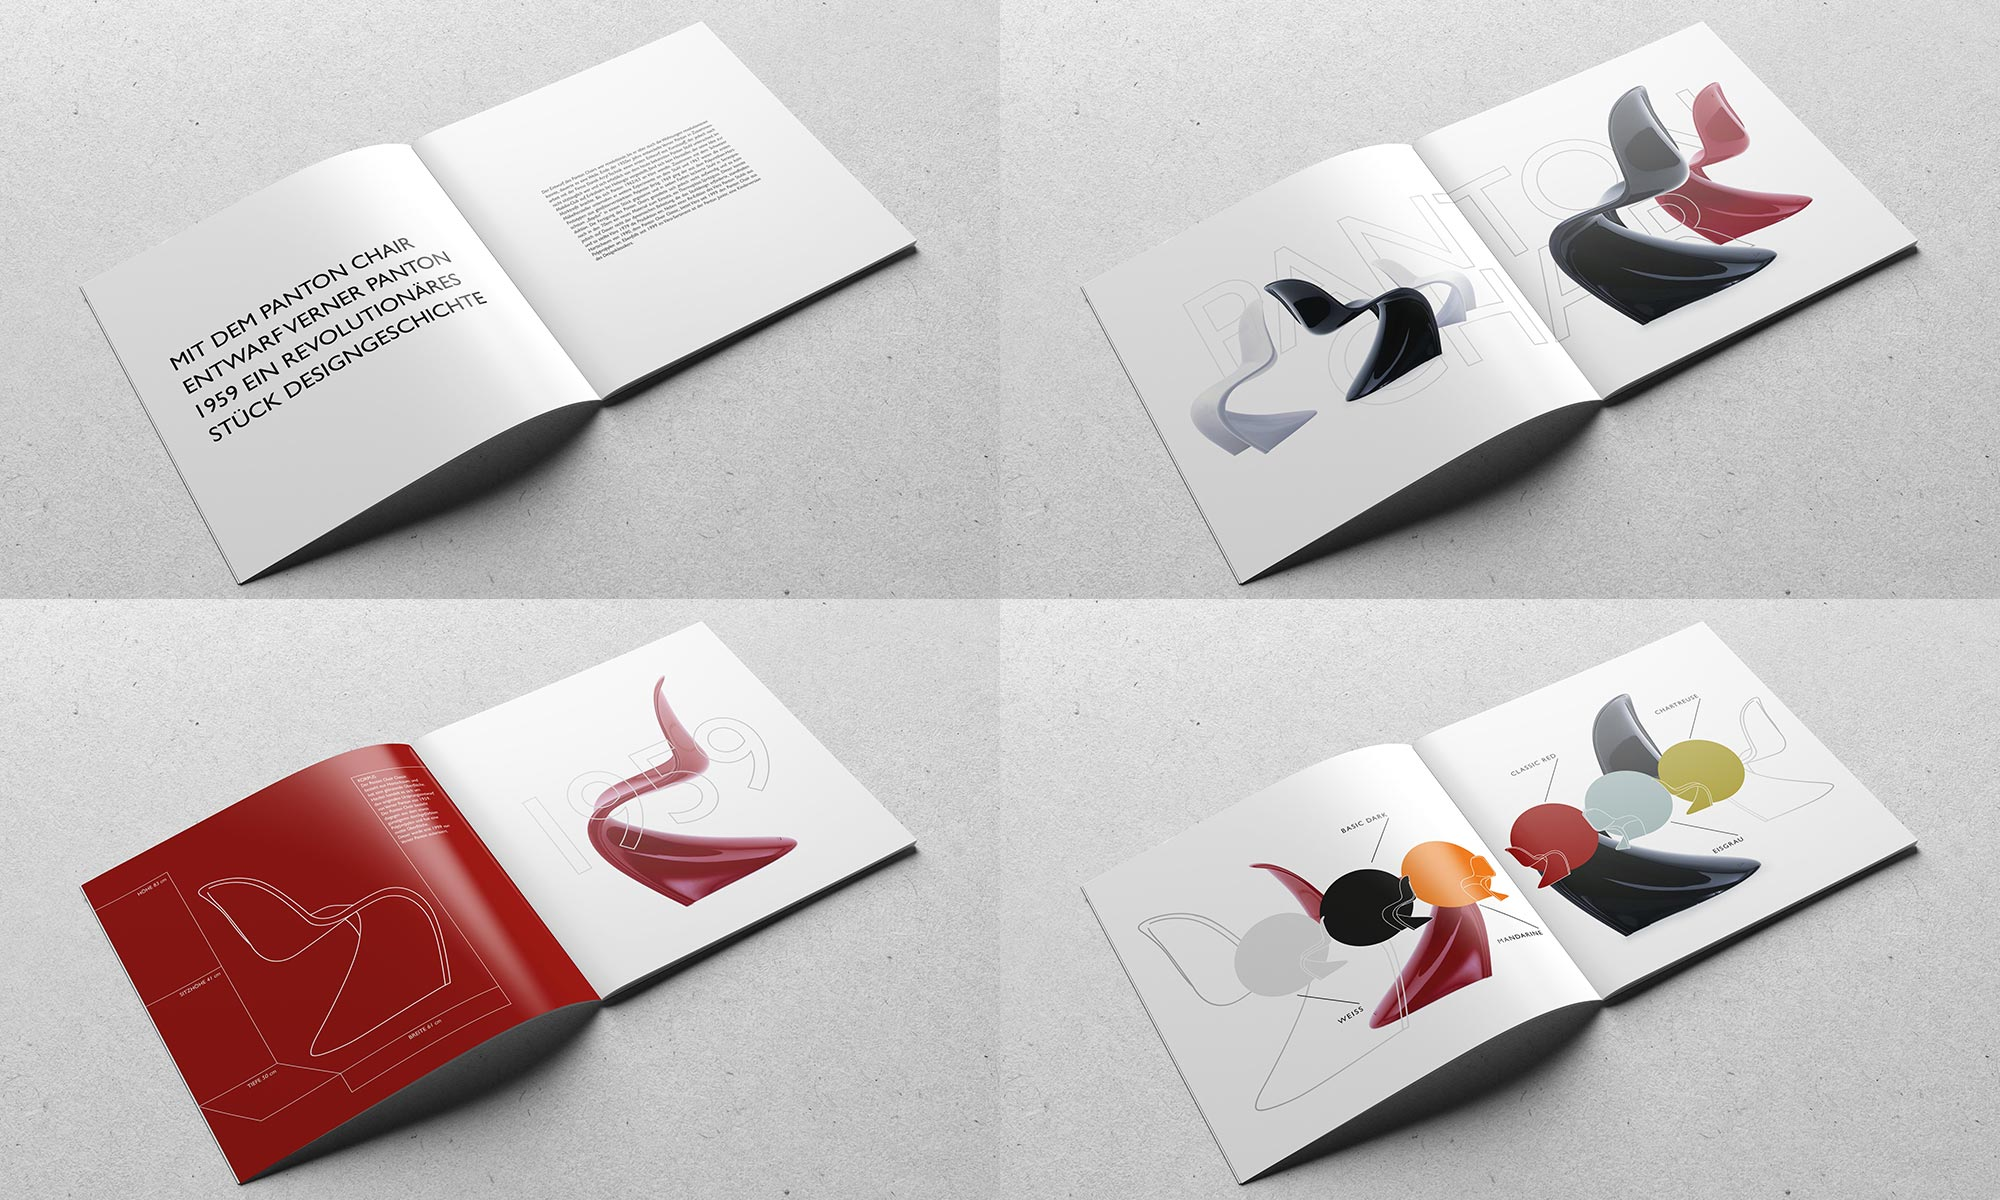 Grafikdesign Editorial Design Verner Panton Chairs